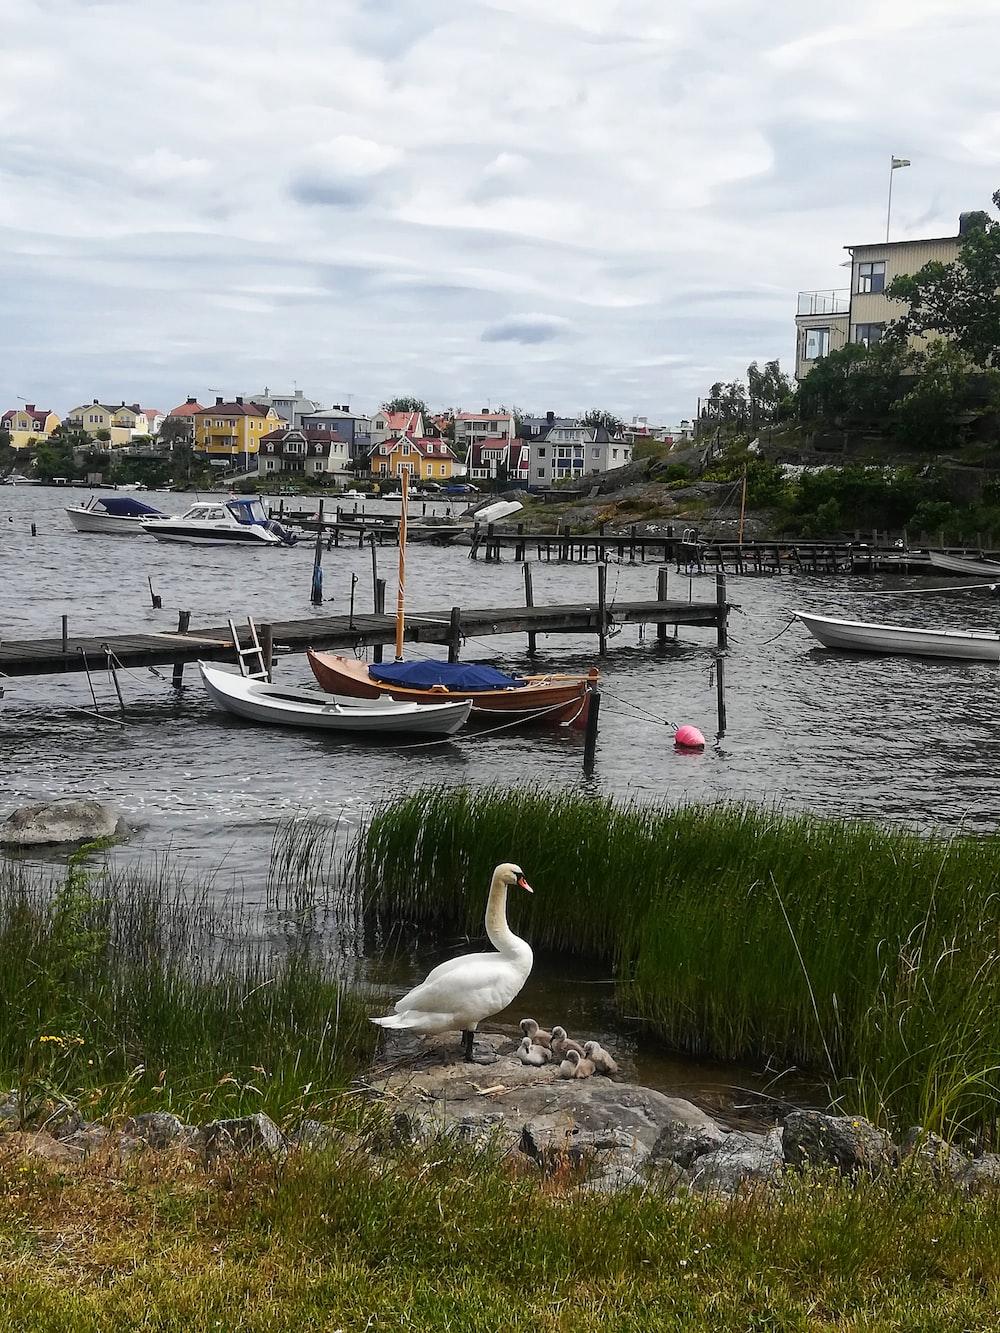 white swan on lake near green grass field during daytime